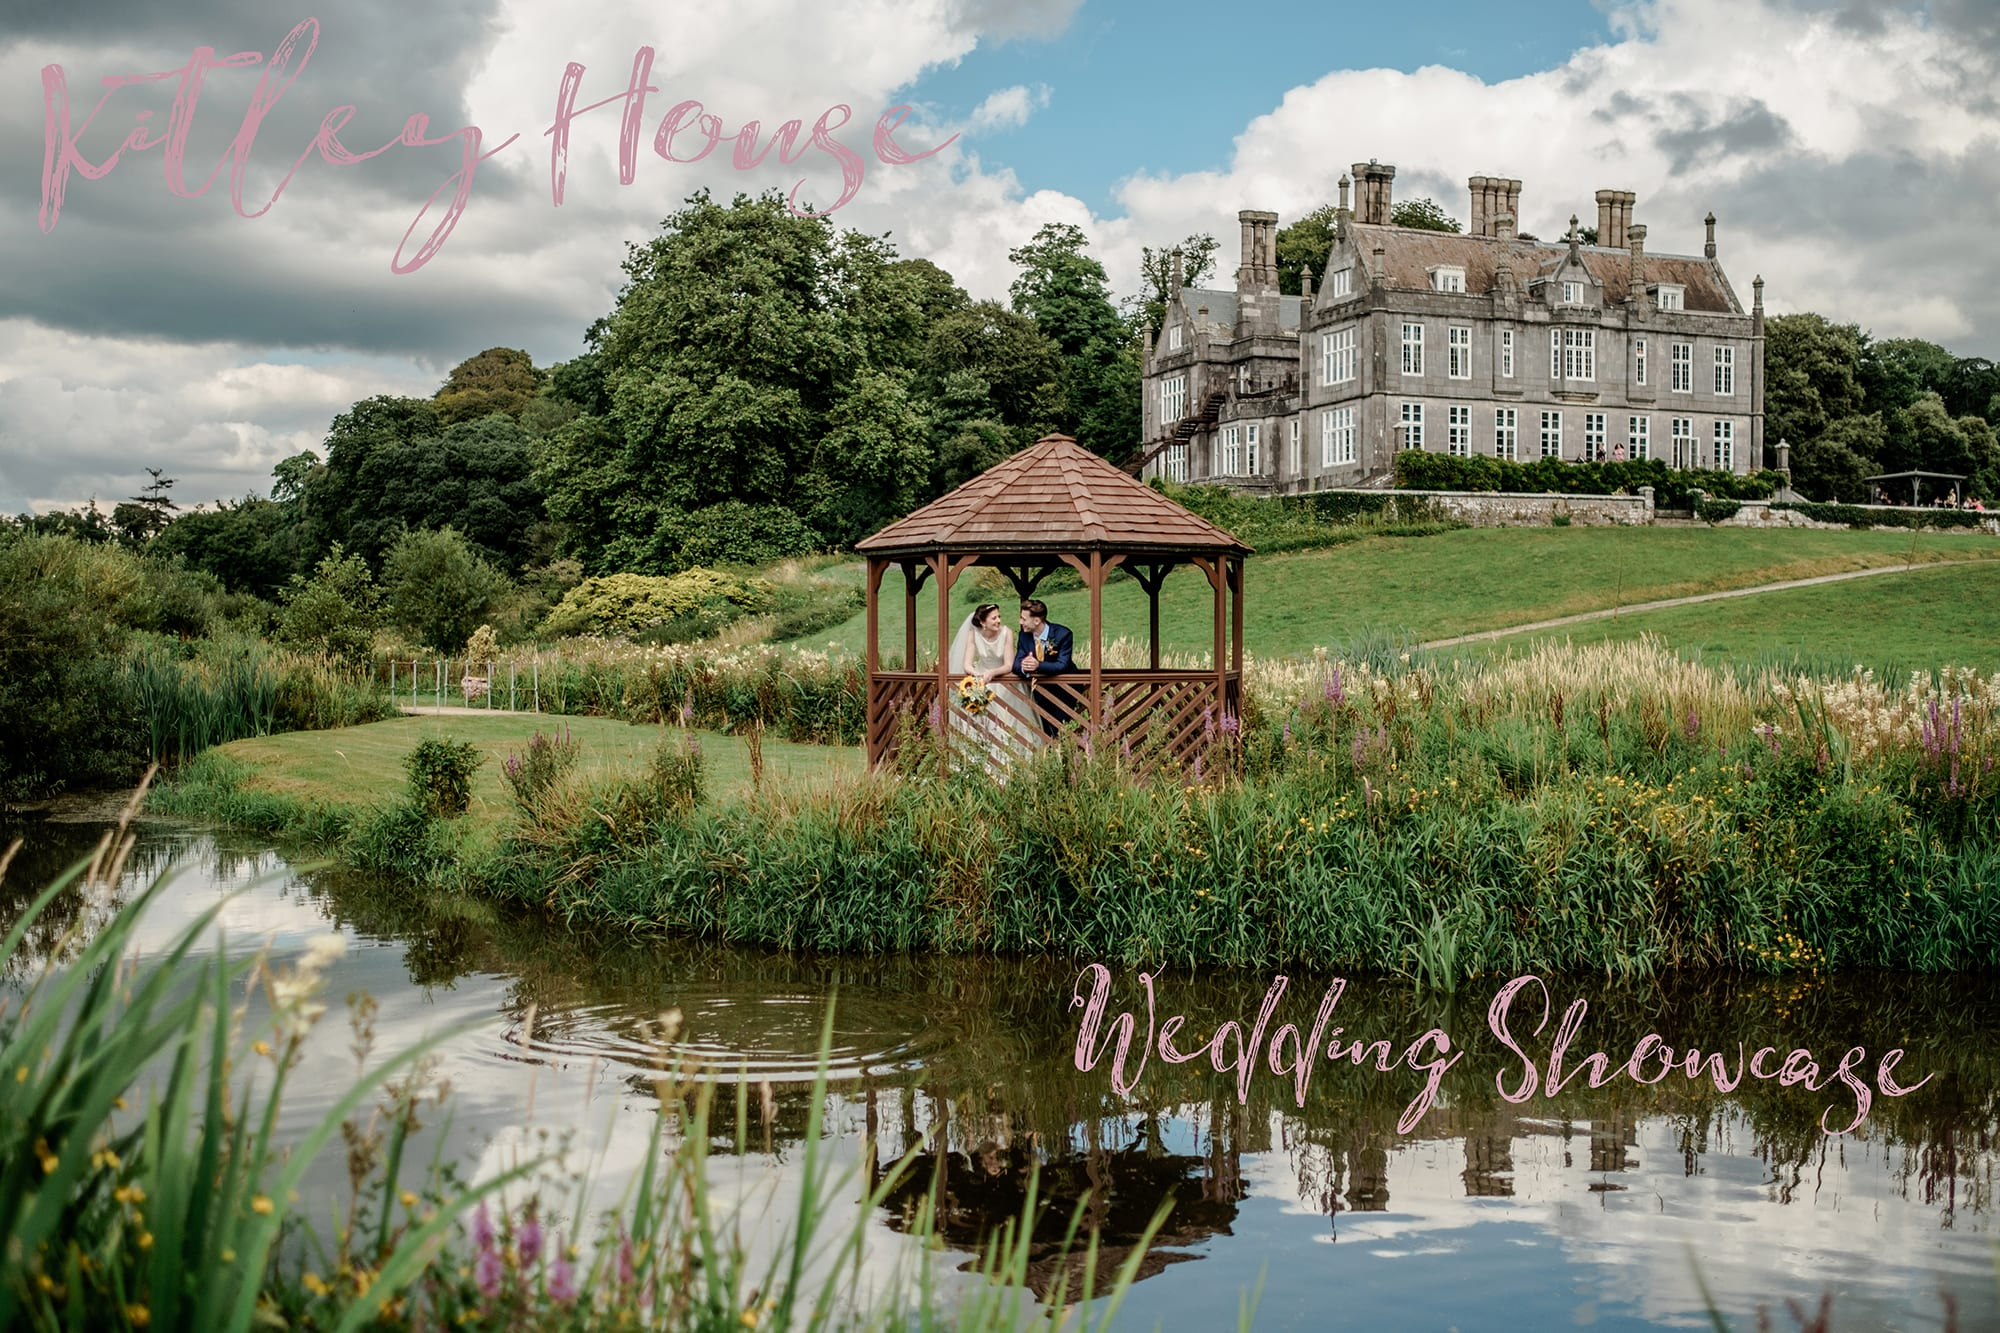 Kitley House Wedding Showcase